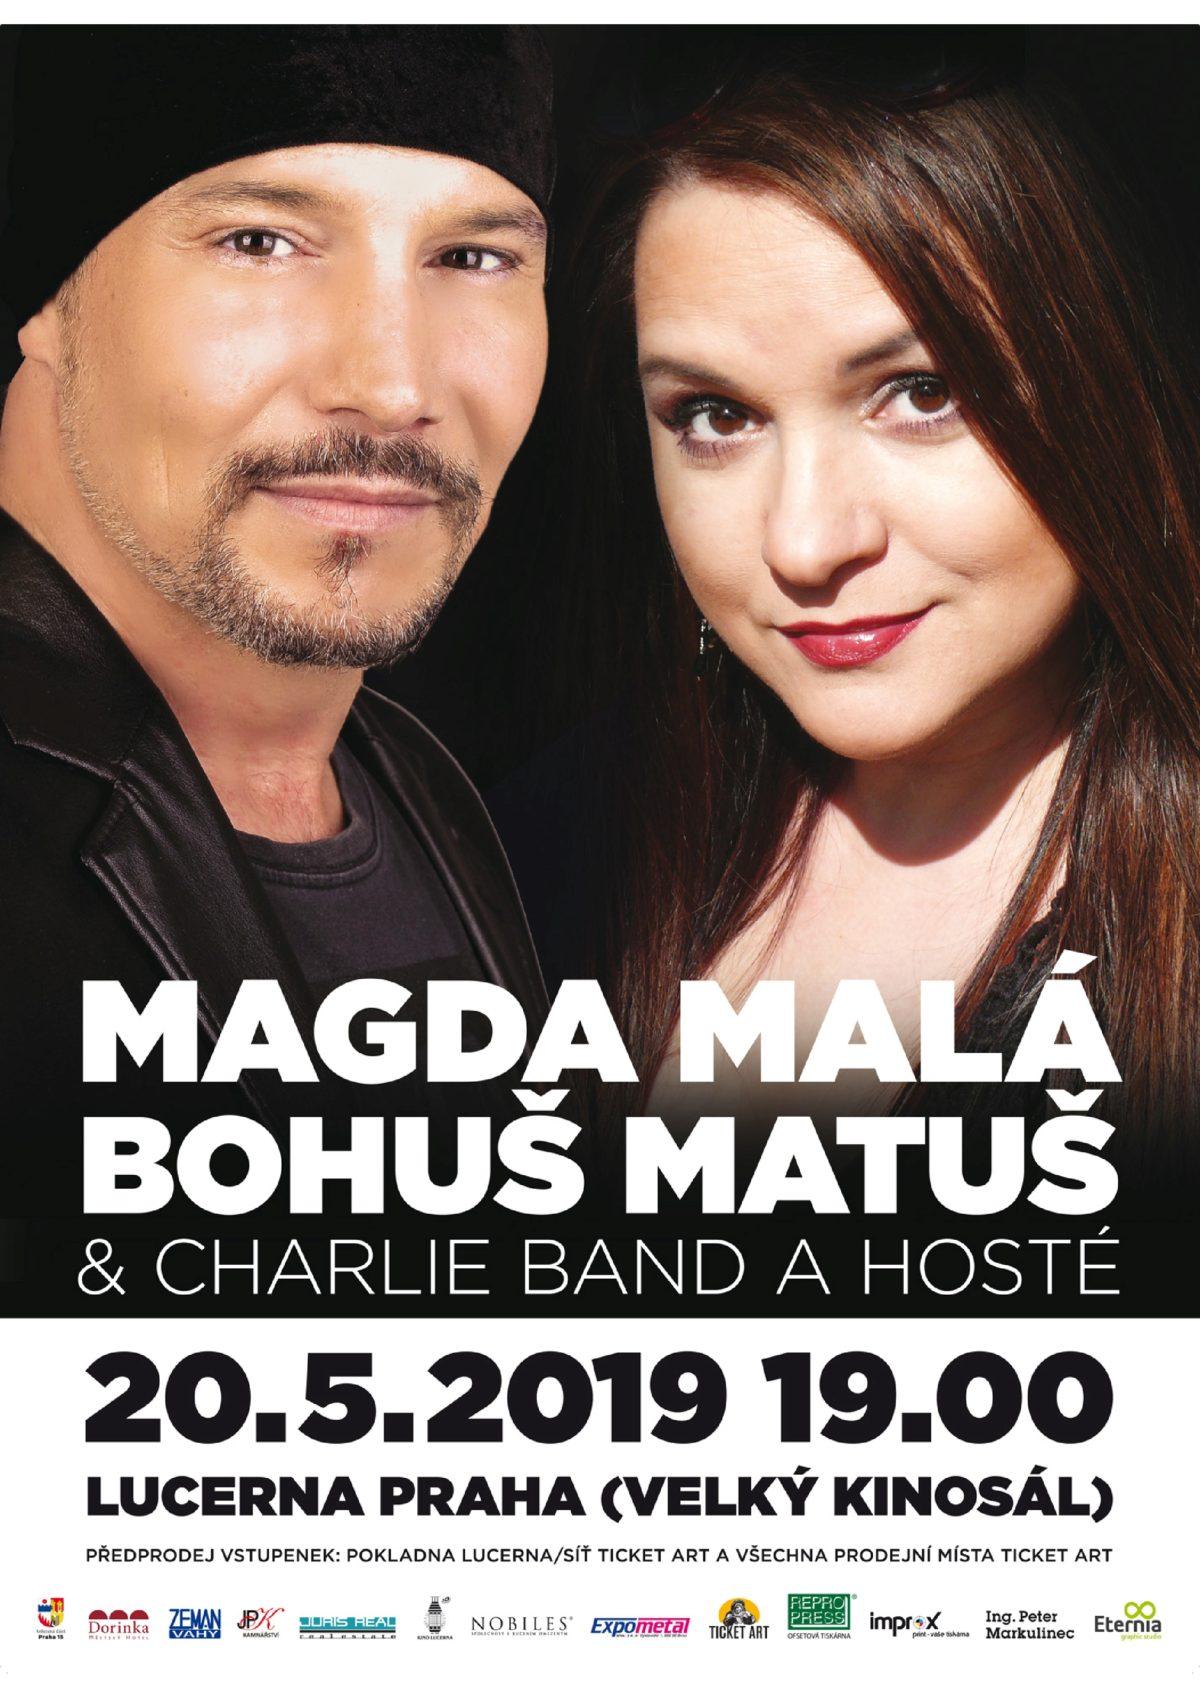 Jedinečný koncert v Lucerně: Magda Malá a Bohuš Matuš